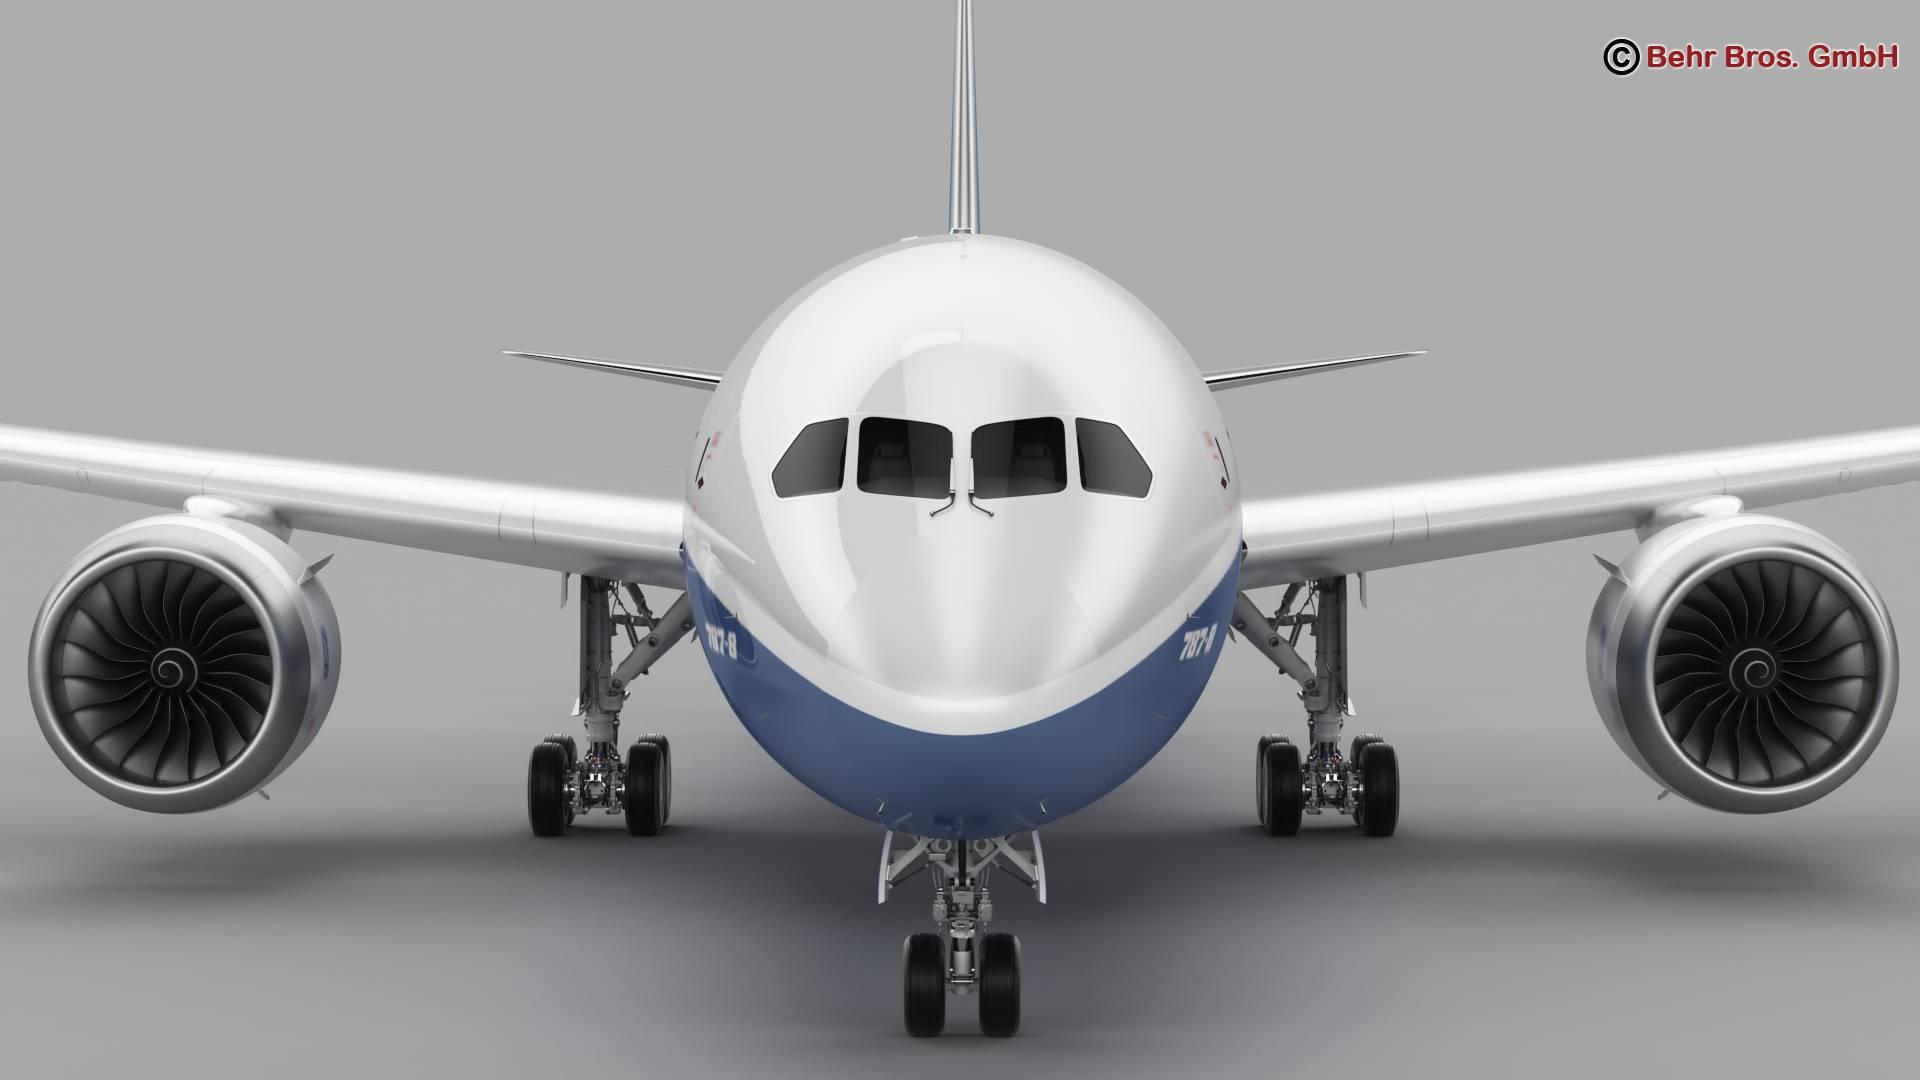 Boeing 787-8 3d gerð 3ds max fbx c4d lwo ma mb obj 251347